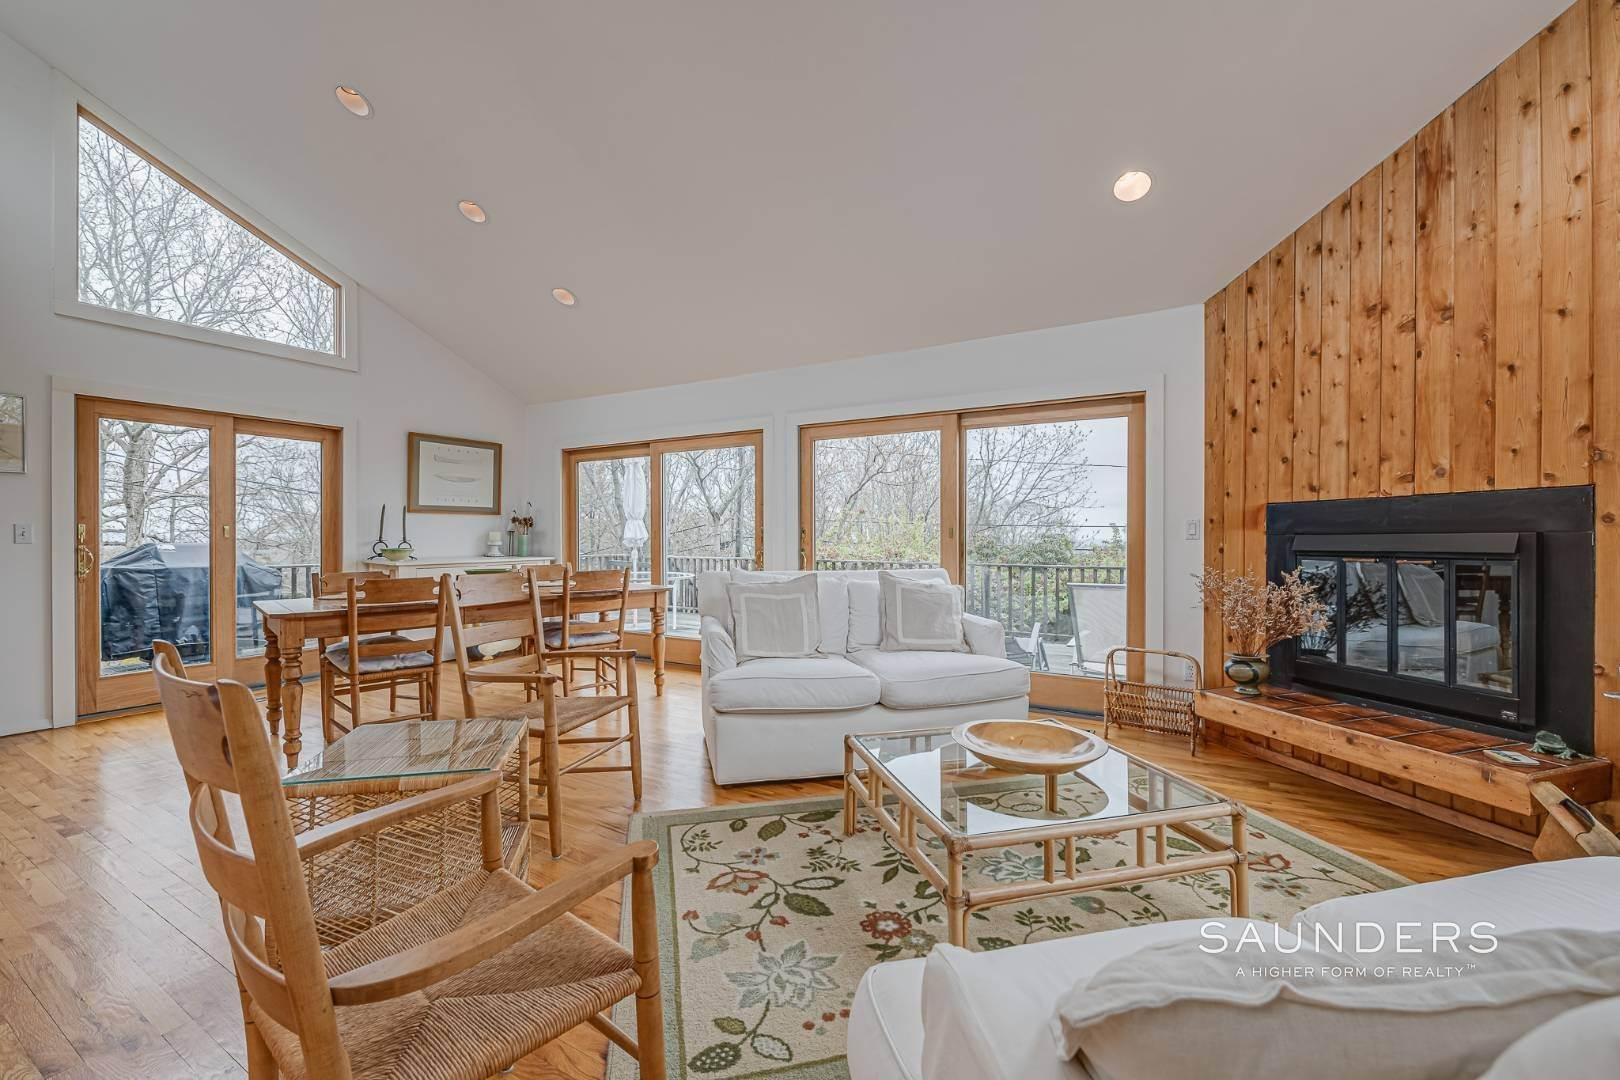 5. Single Family Homes for Sale at Montauk Beach House 8 Stuyvesant Drive, Montauk, East Hampton Town, NY 11954